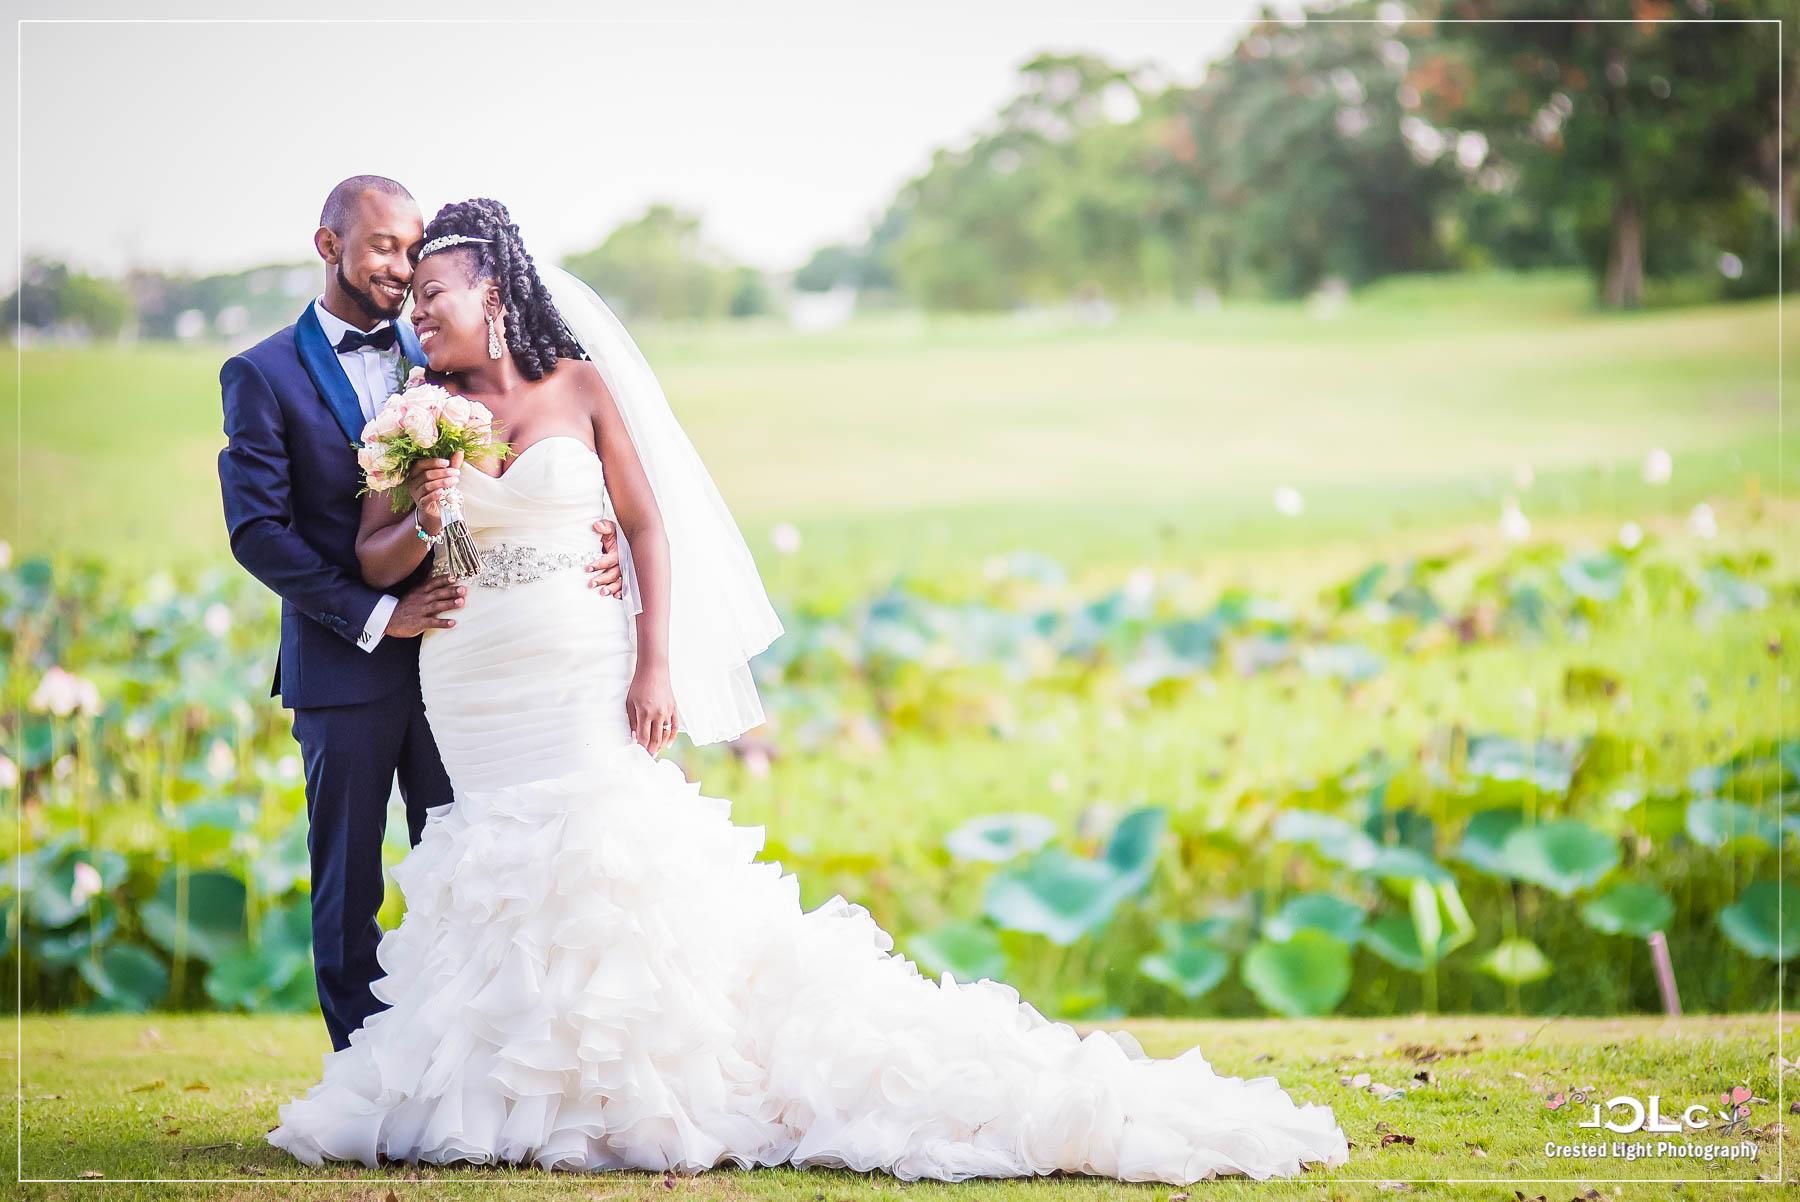 Trinidad and Tobago Wedding Photographer